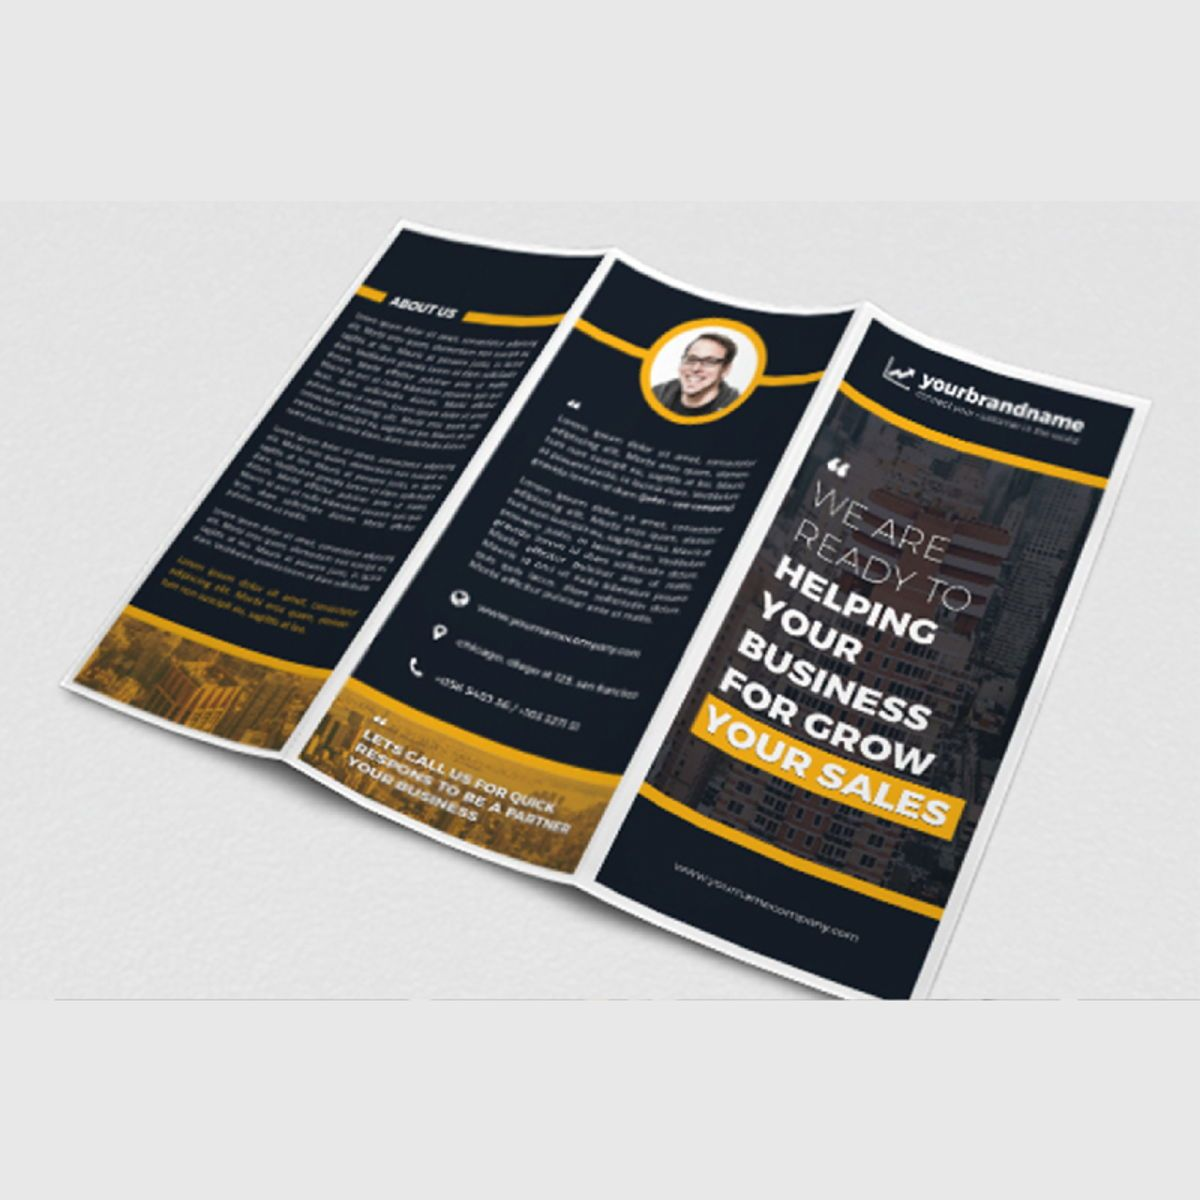 Business Company Trifold Brochure Photoshop Template, Slide 3, 08449, Business — PoweredTemplate.com